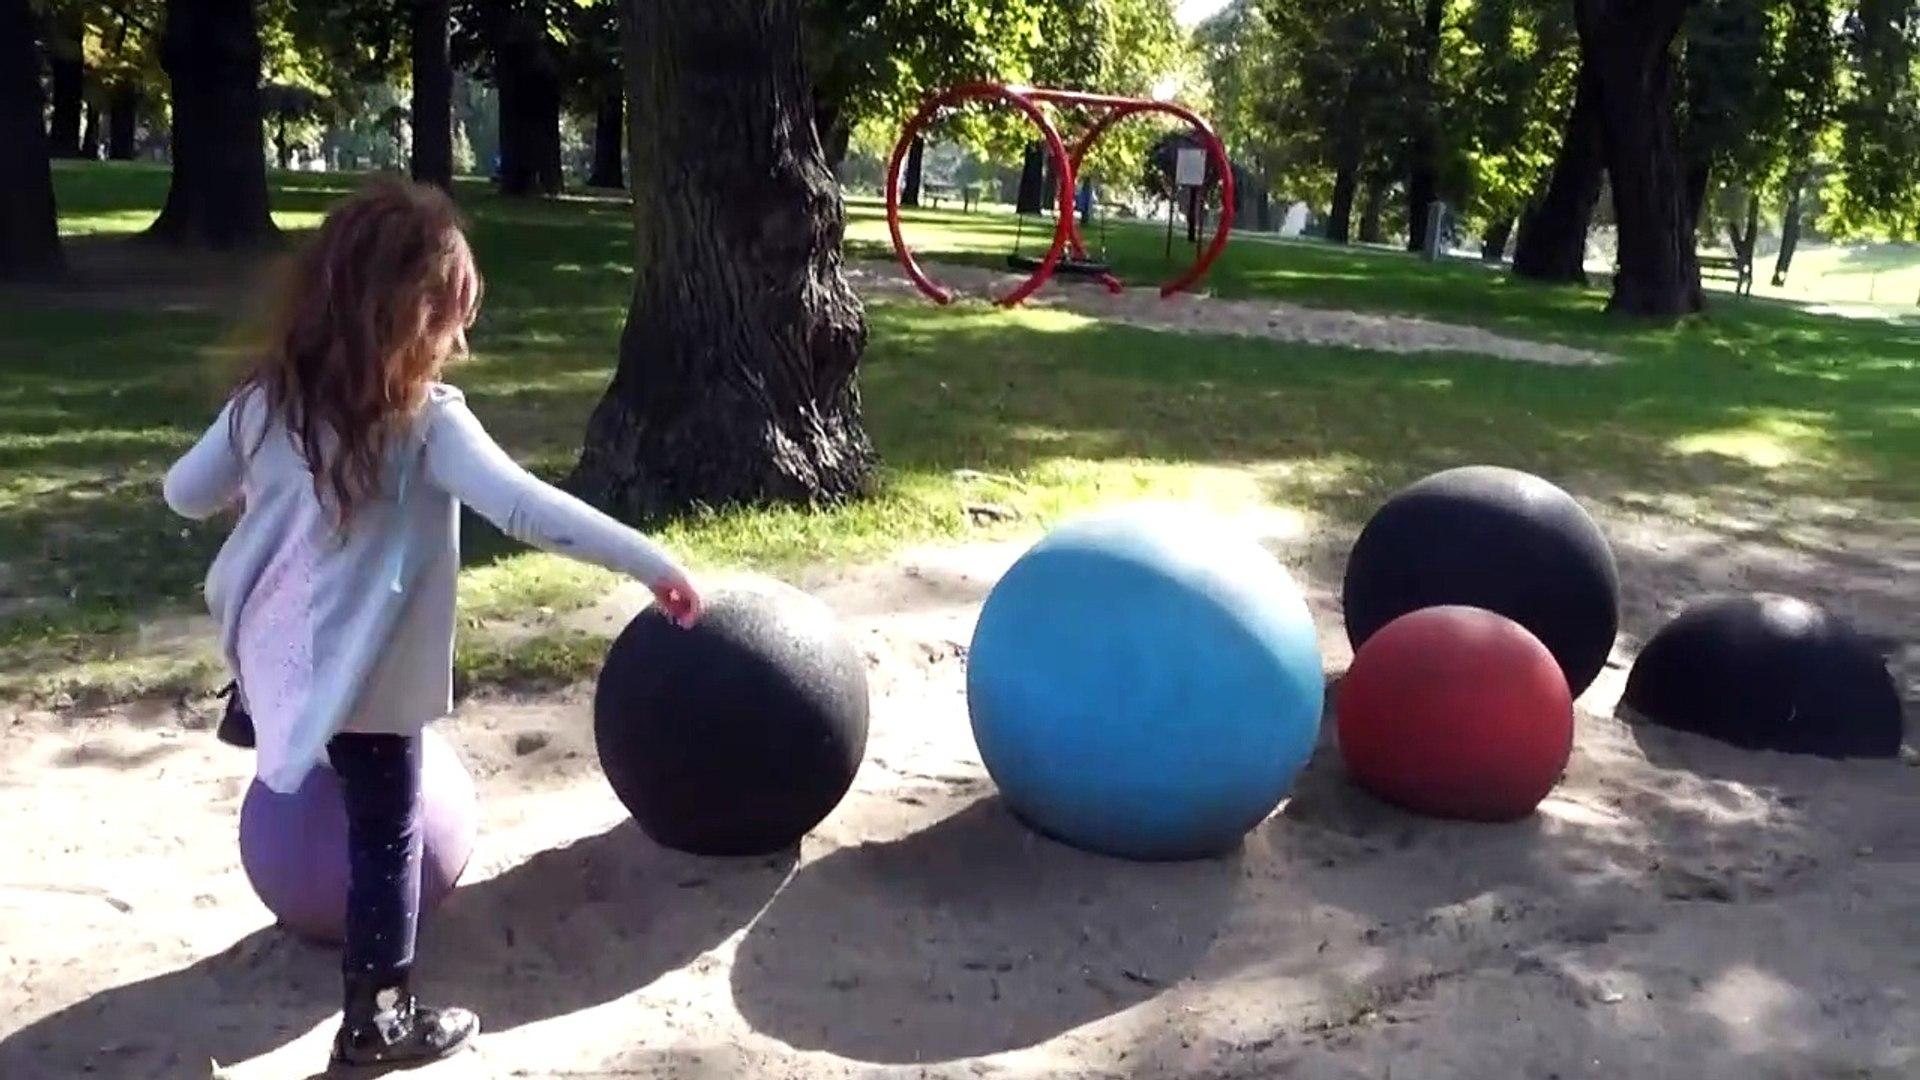 Playground with Balls Kids Playing